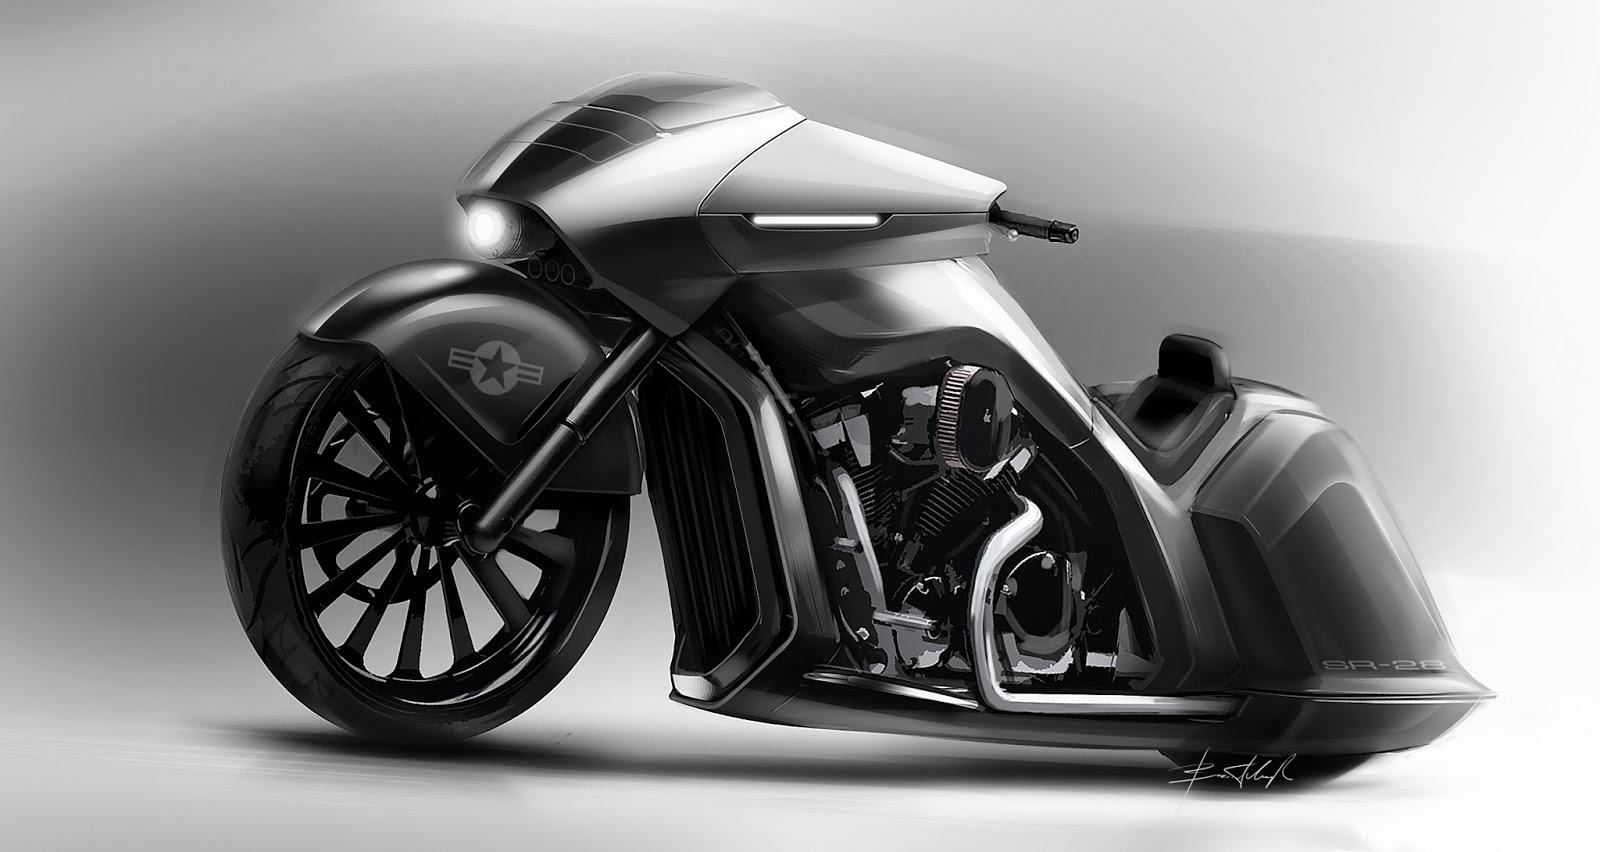 sr 28 custom motorcycle based on honda vtx 1800 [ 1600 x 852 Pixel ]